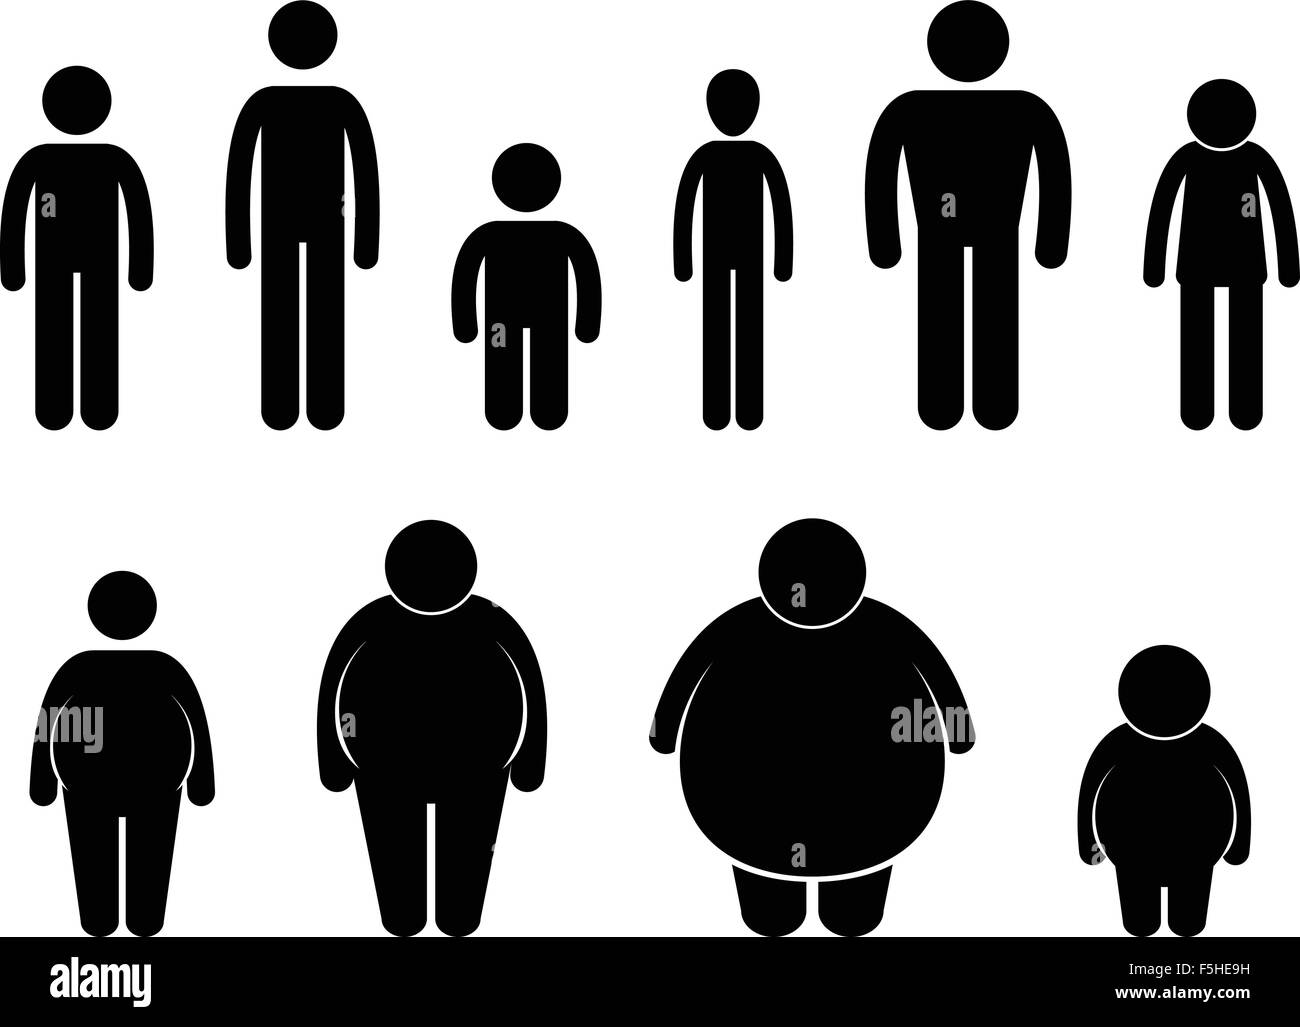 Man Body Figure Size Icon Symbol Sign Pictogram Stock